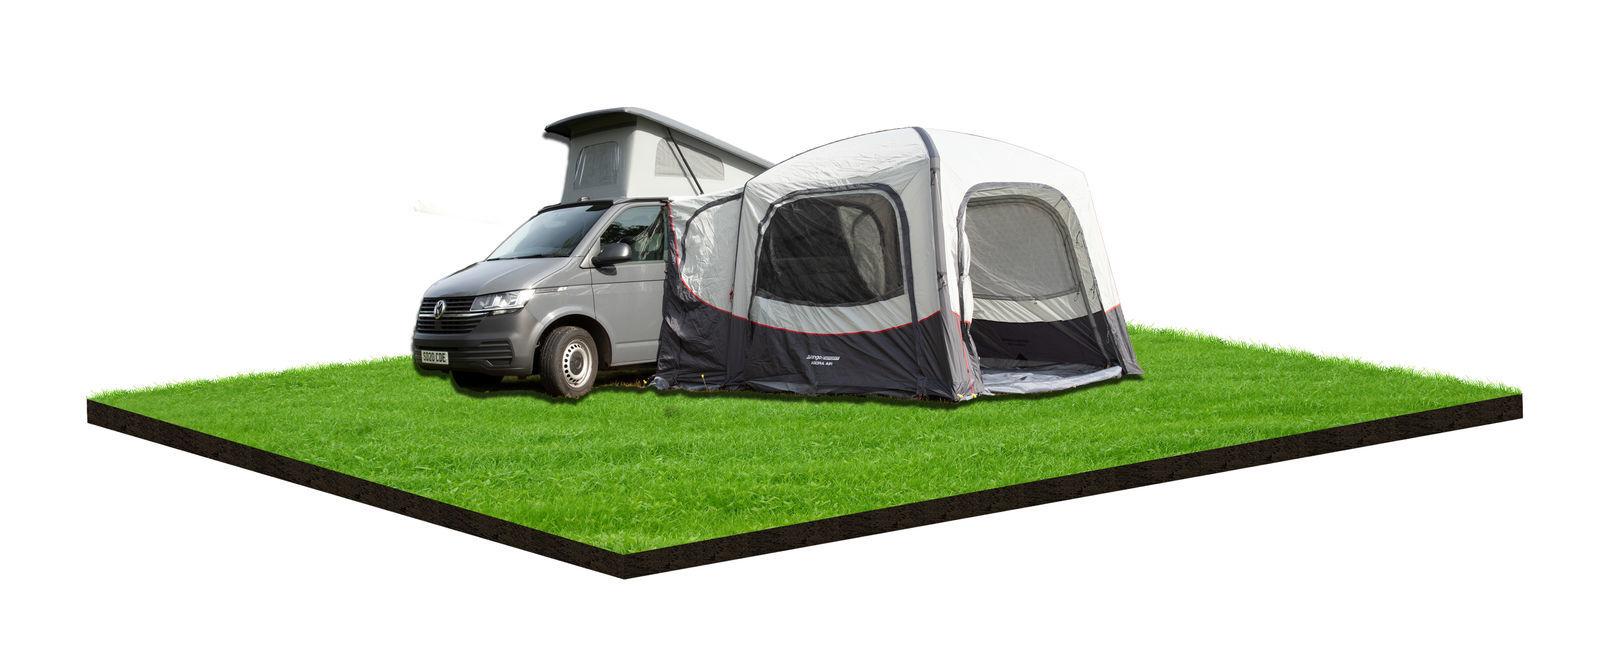 Vango Agora Driveaway 2021 Norwich Camping 6